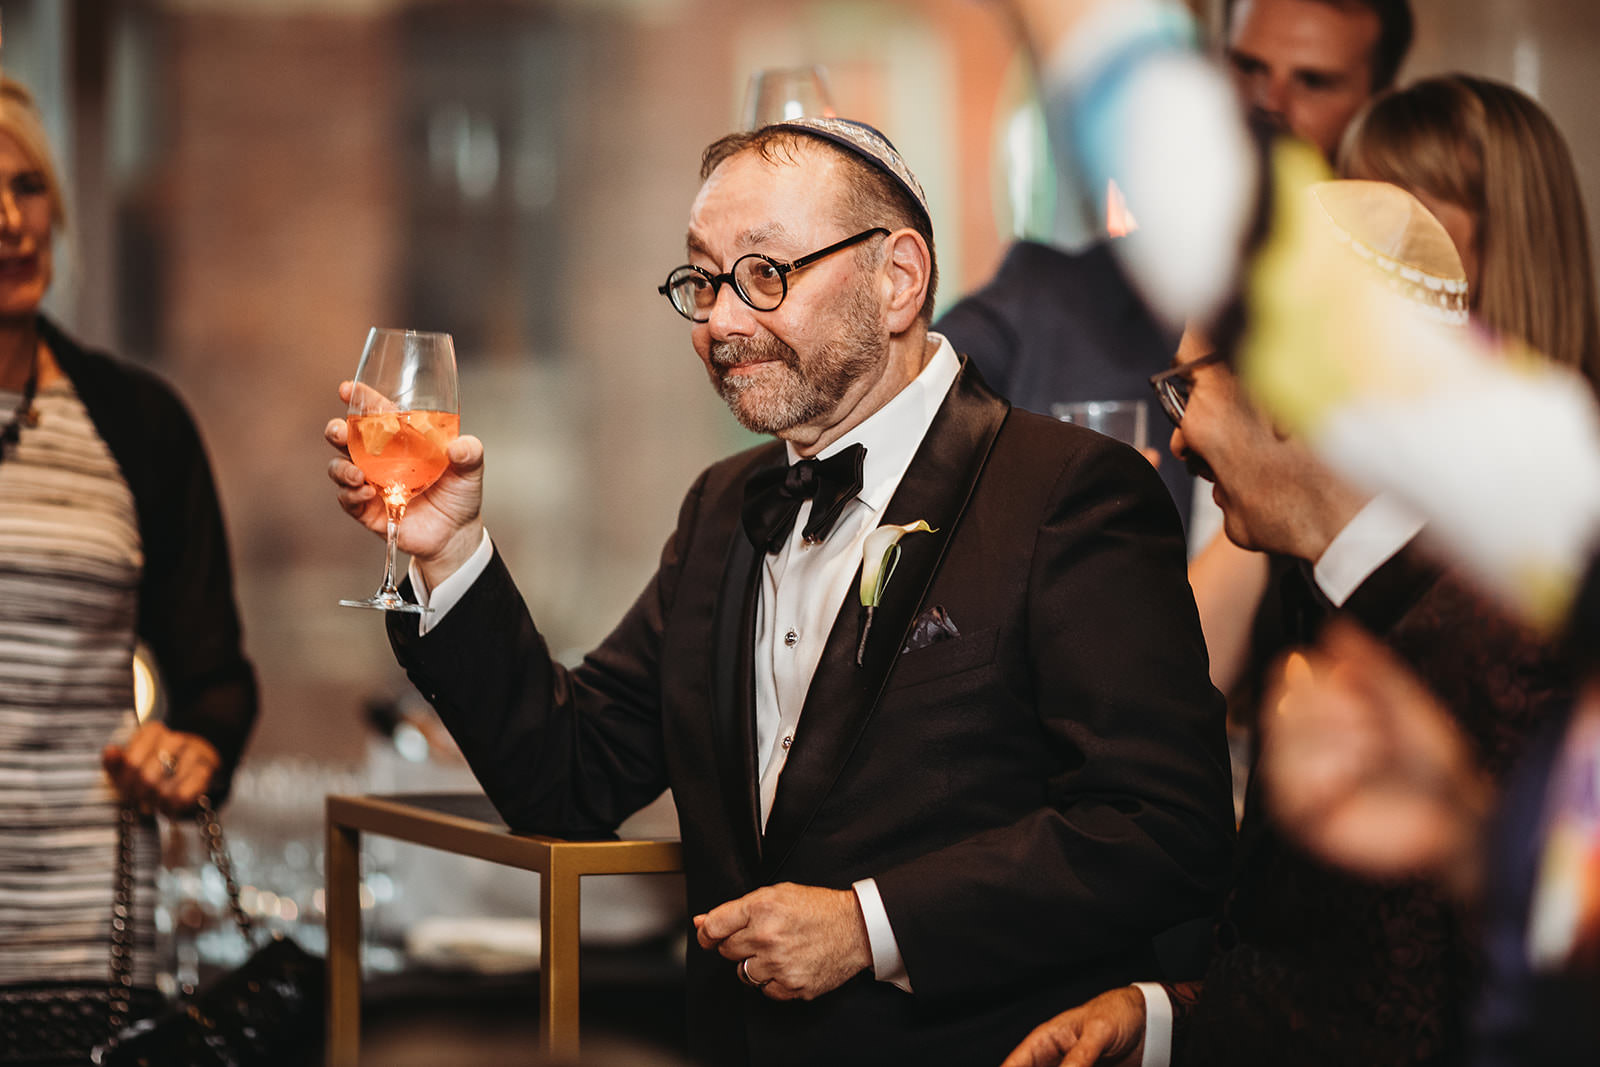 luma restaurant wedding photographer